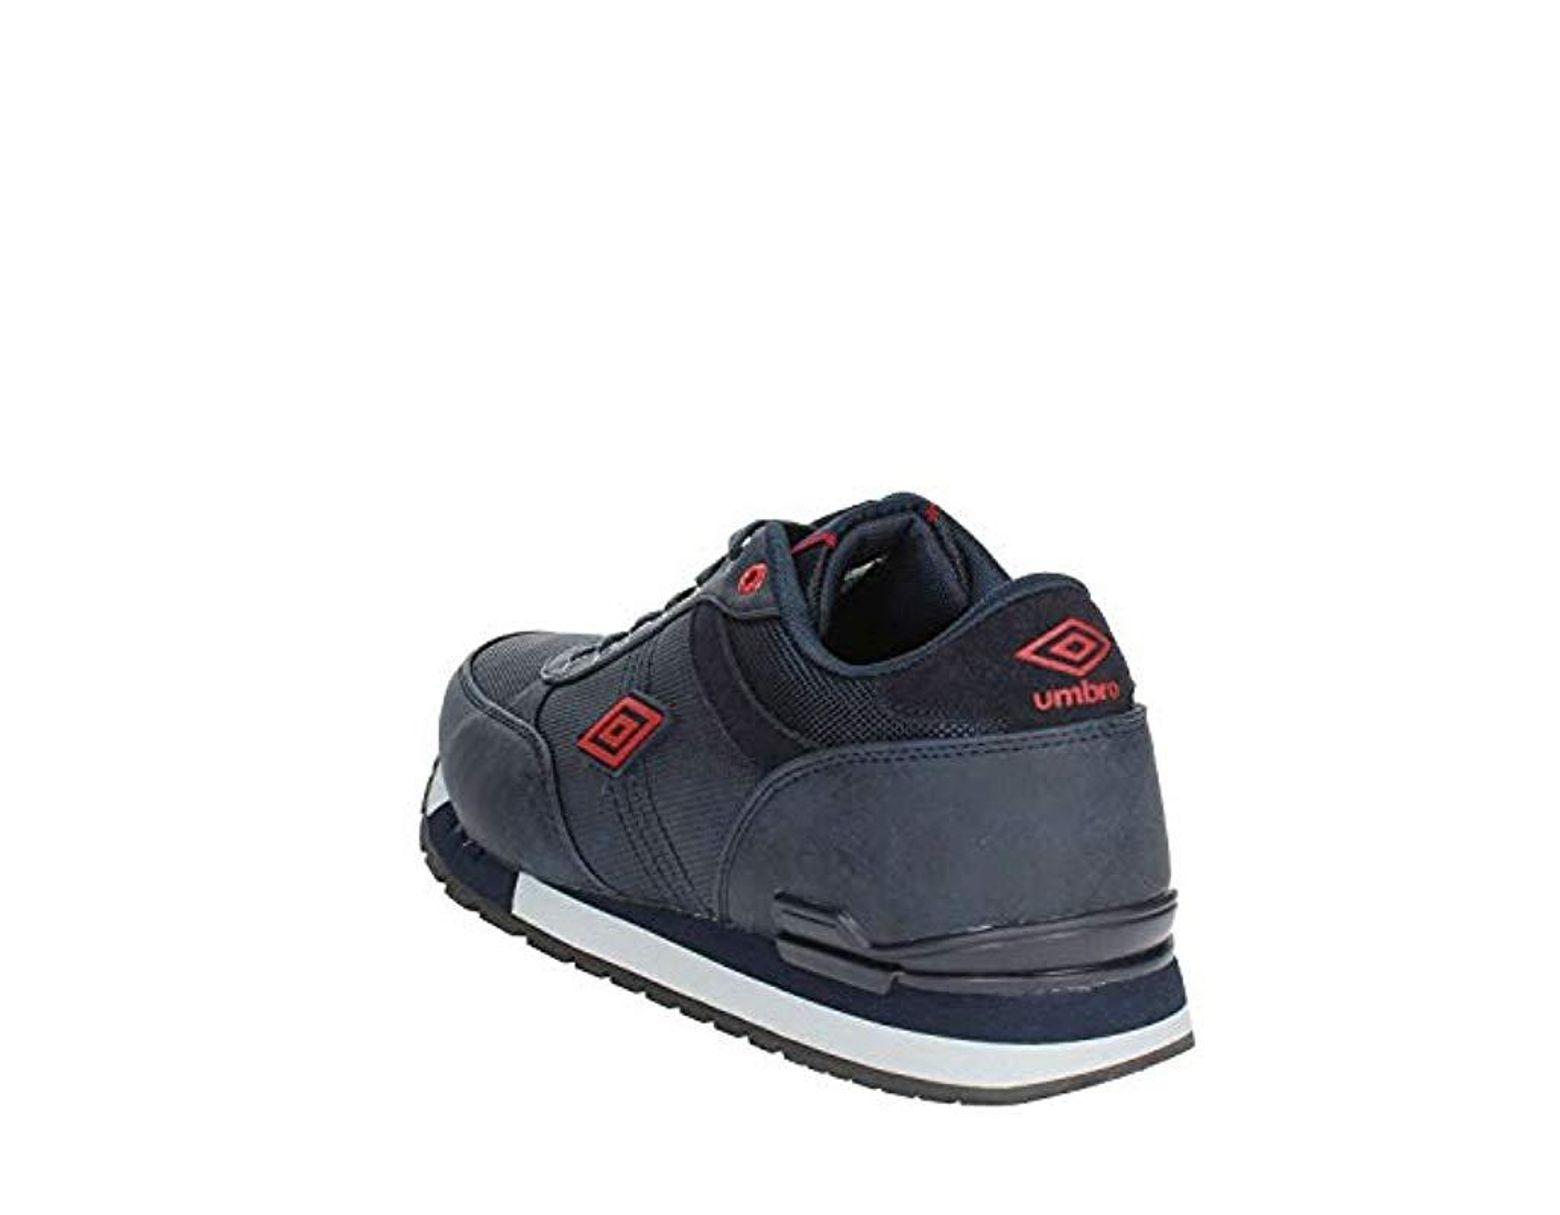 6412638d411a9d Umbro Scarpe Sneakers Eva Jogging Navy Rif. Rfp38005s in Blue for Men -  Save 49% - Lyst